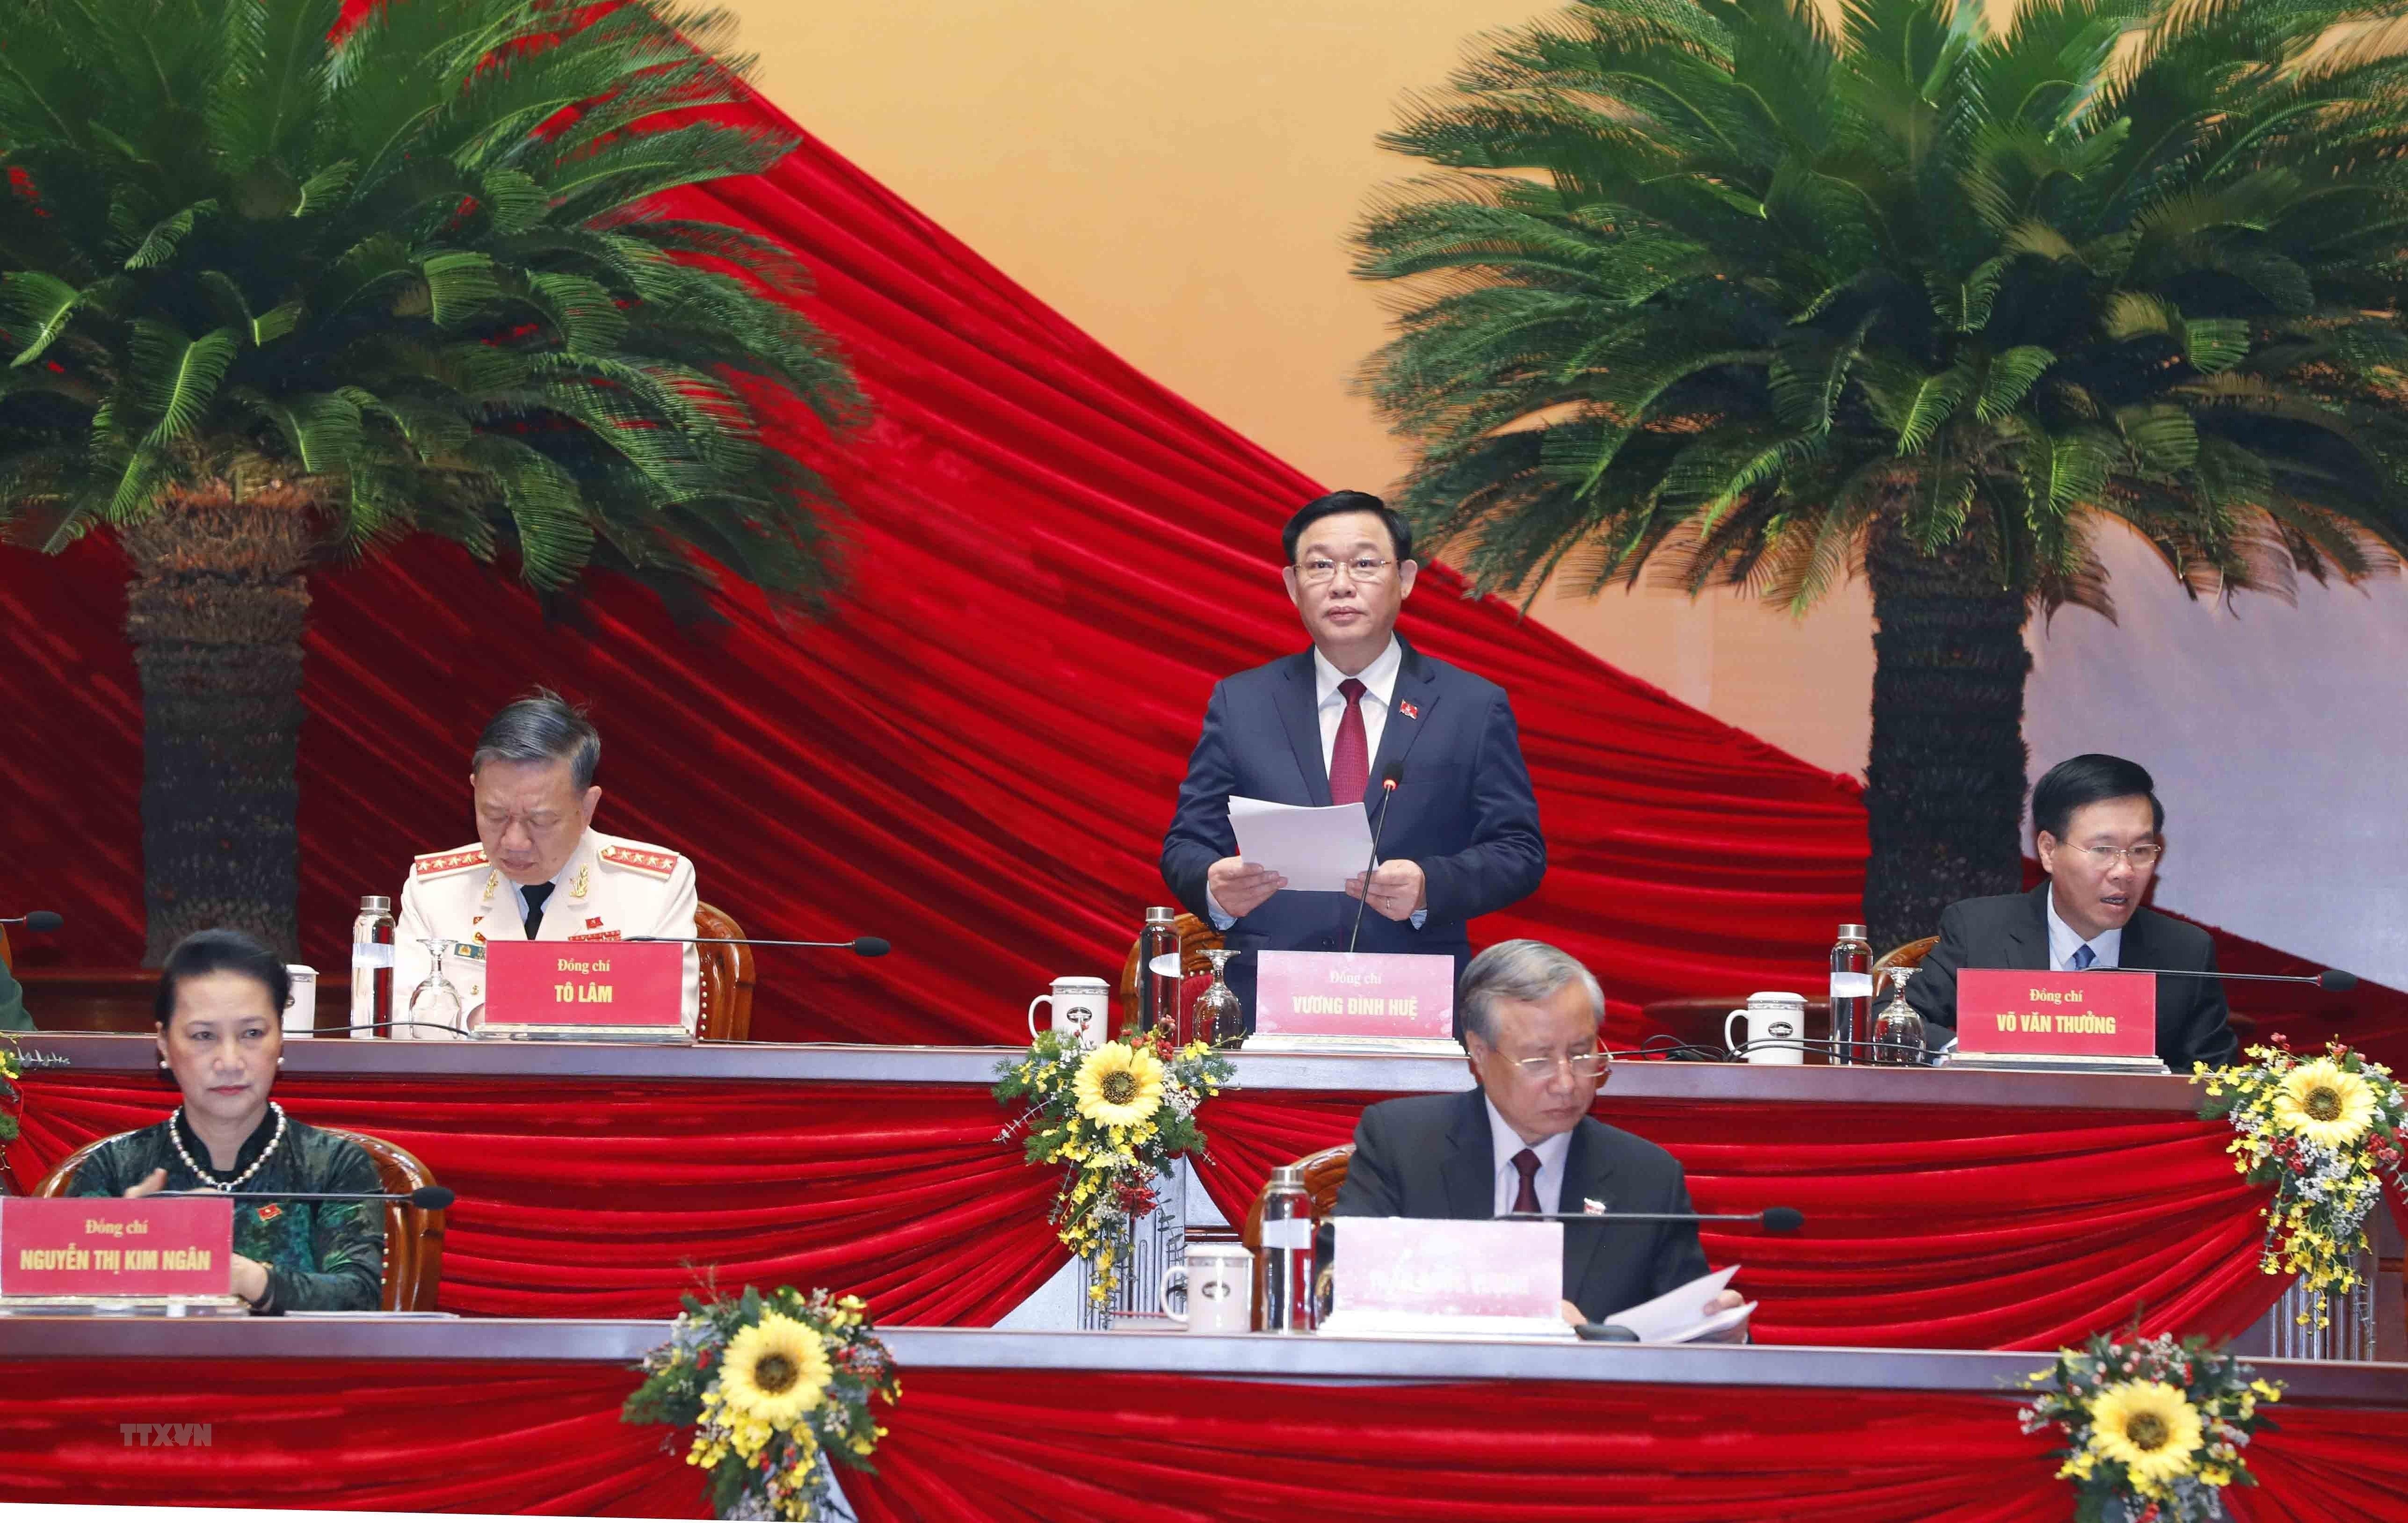 [Photo] Quang canh phien thao luan cac van kien Dai hoi XIII cua Dang hinh anh 1